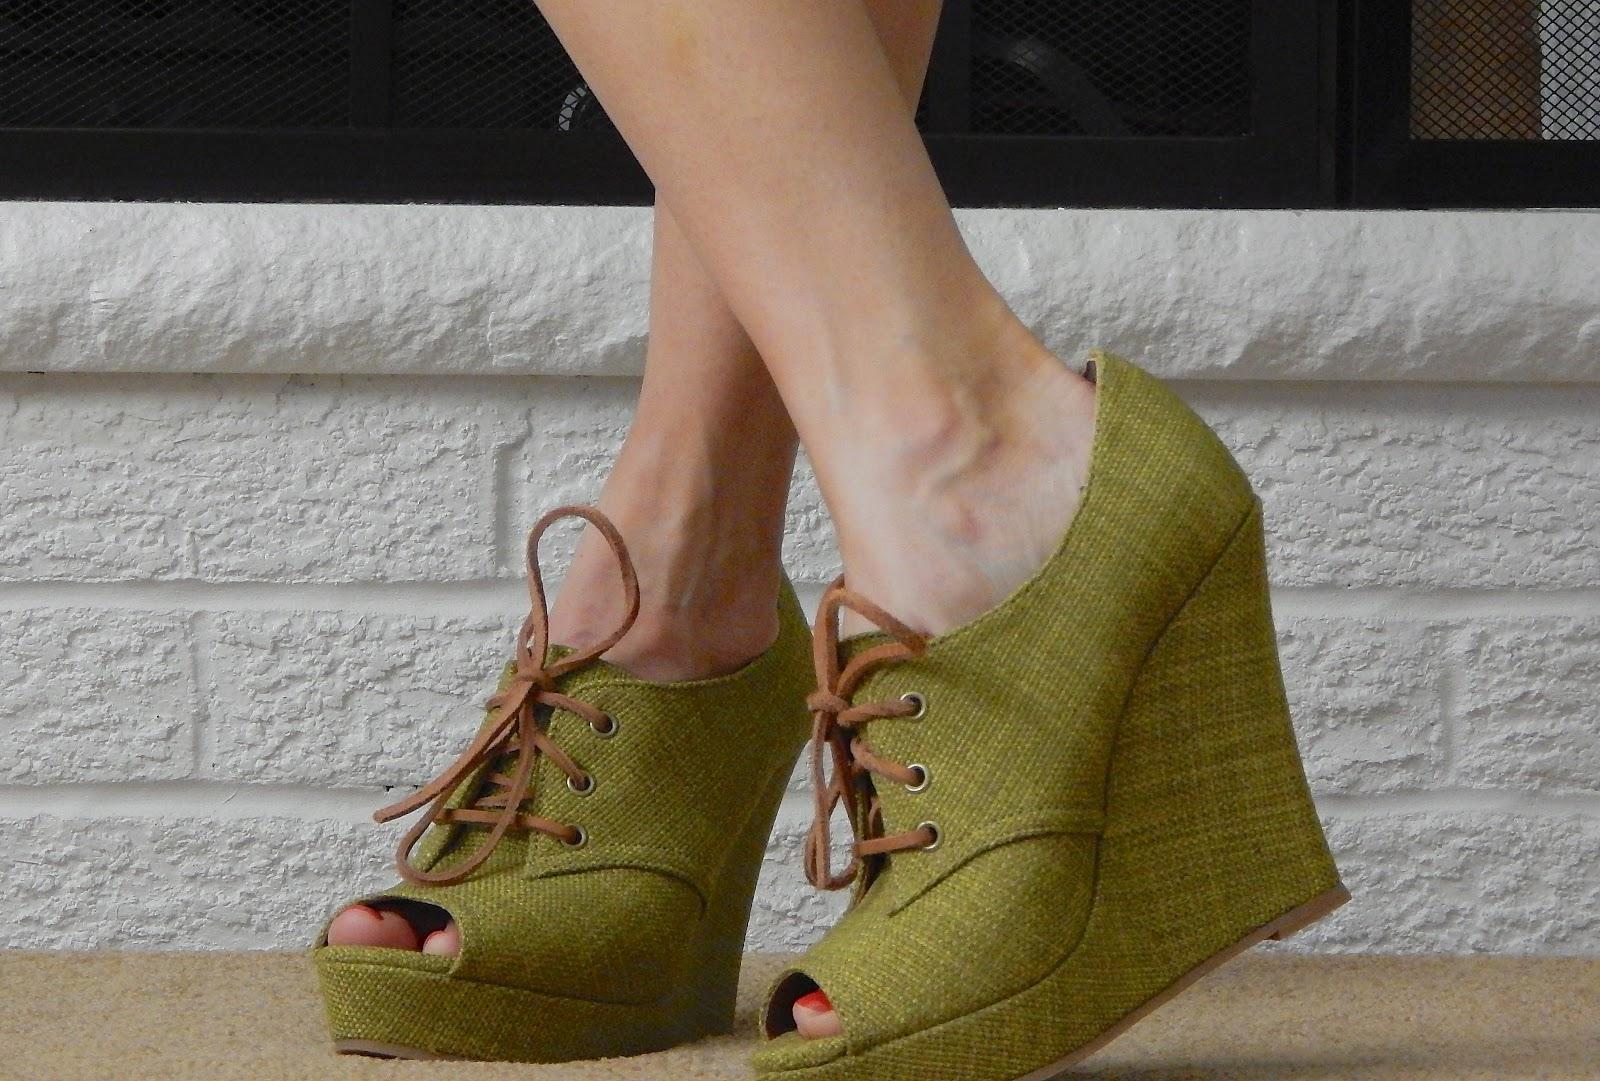 Open-toe Lace-up Shoe is a